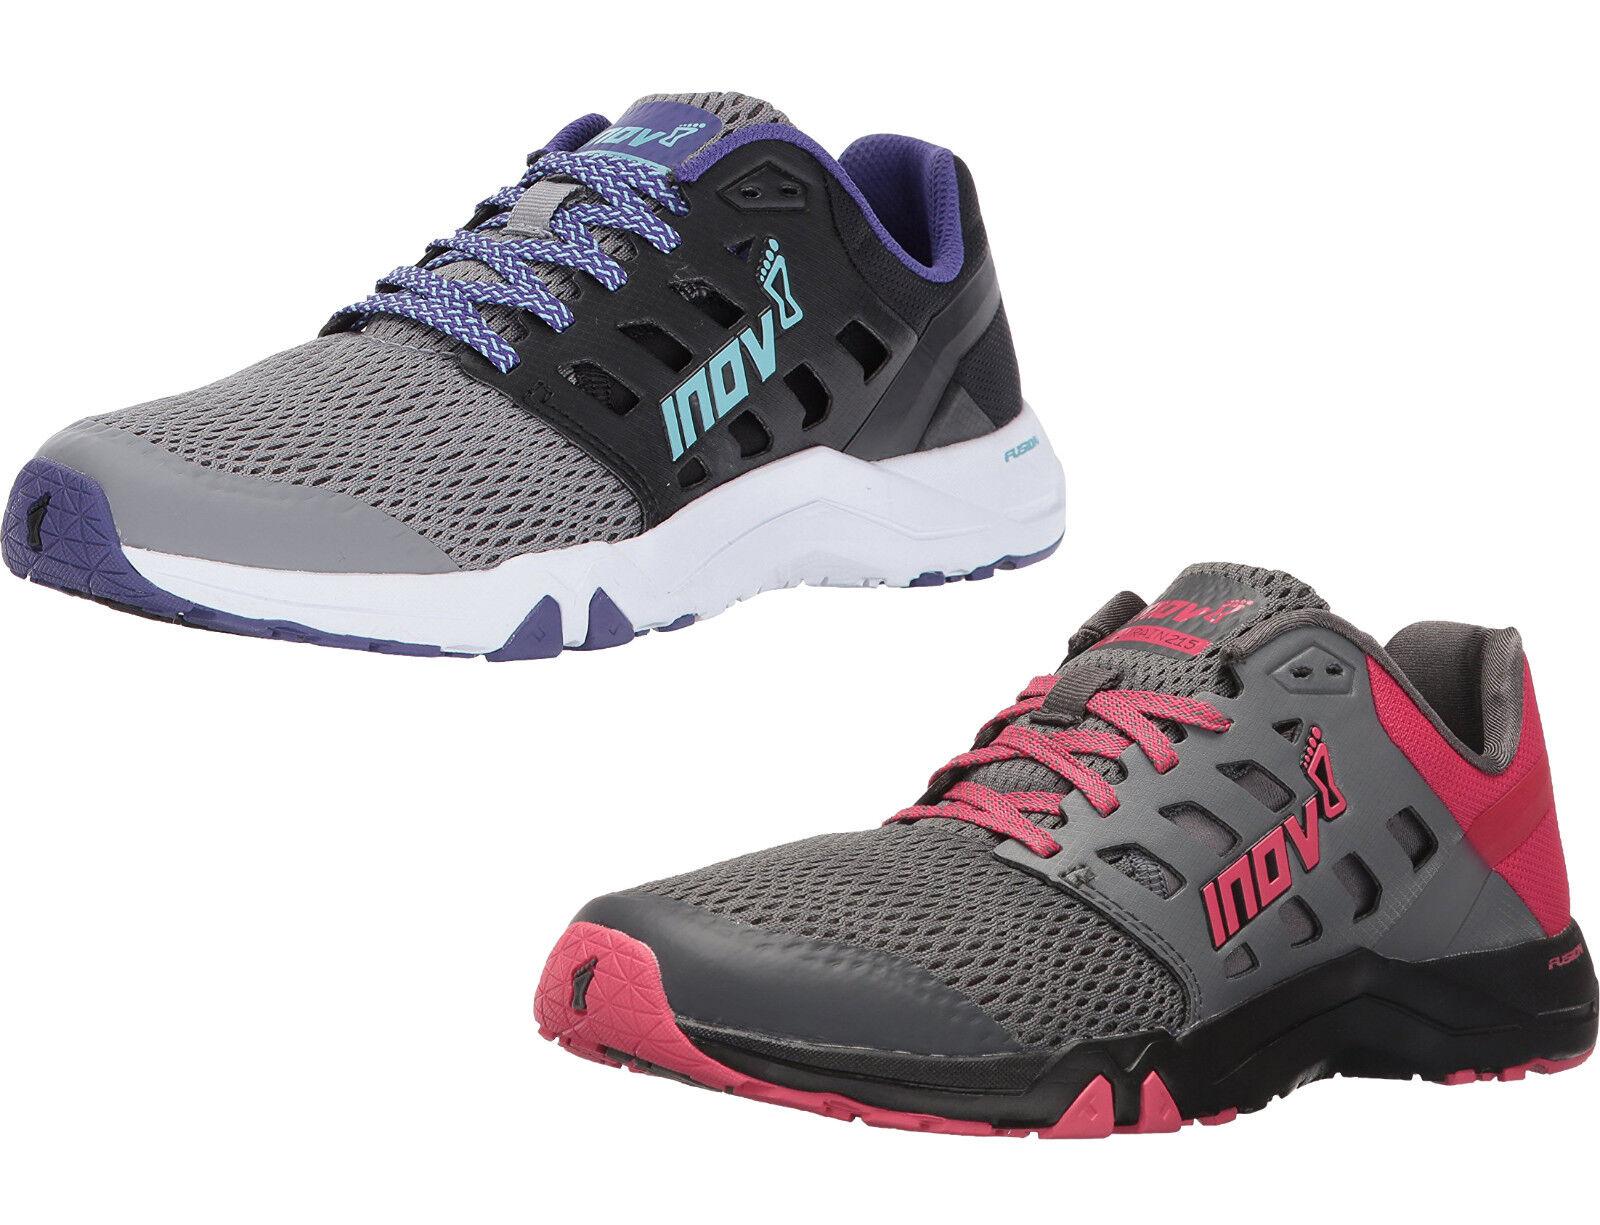 Inov-8 All Train 215 femmes Cross Training Chaussures Running Sneakers Inov-8 NEW